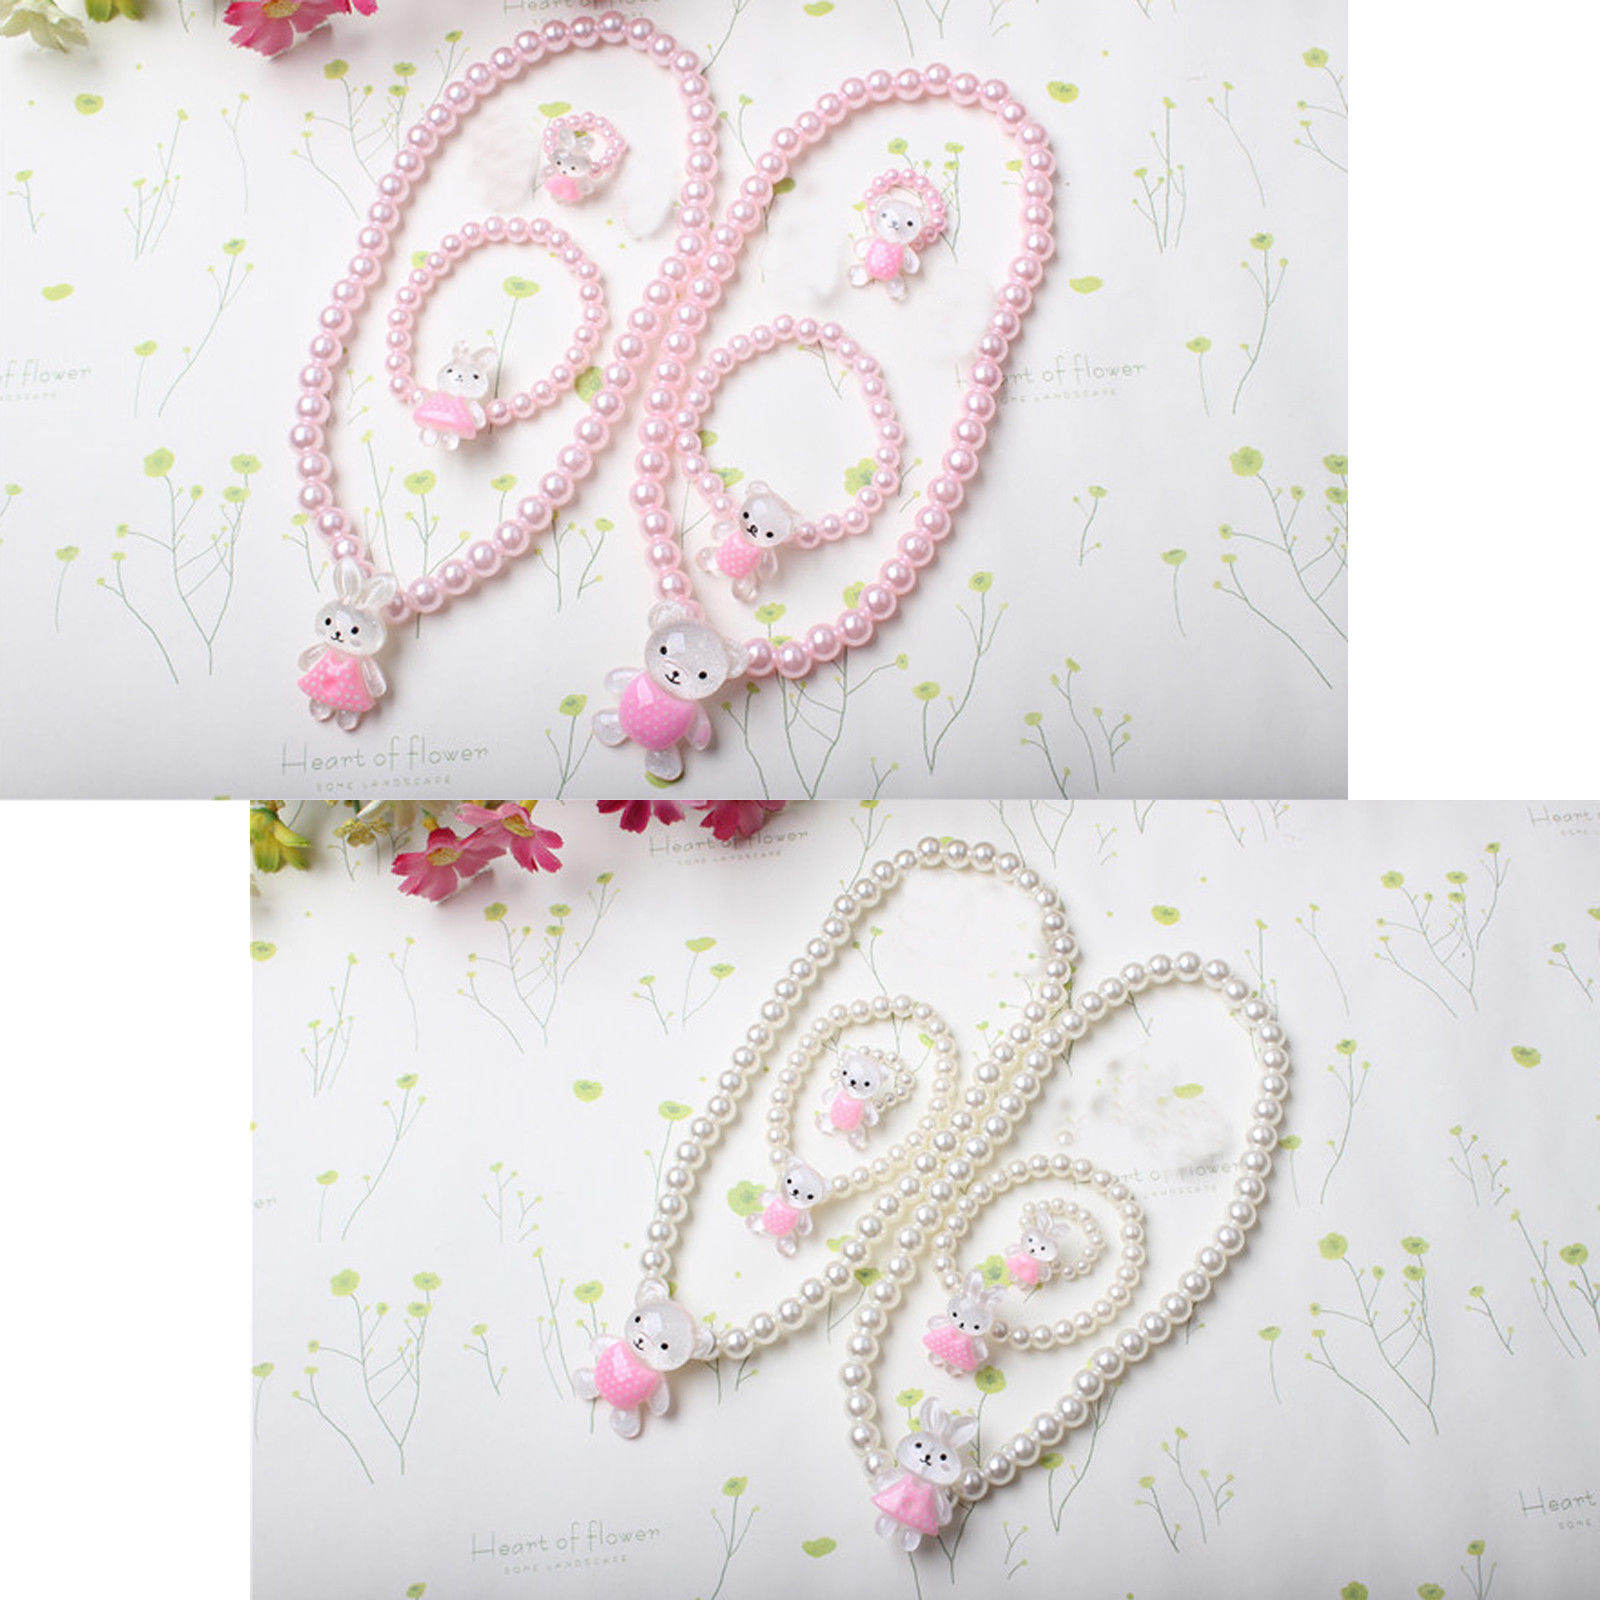 Cute baby kids girls princess beads necklaceubraceleturing set